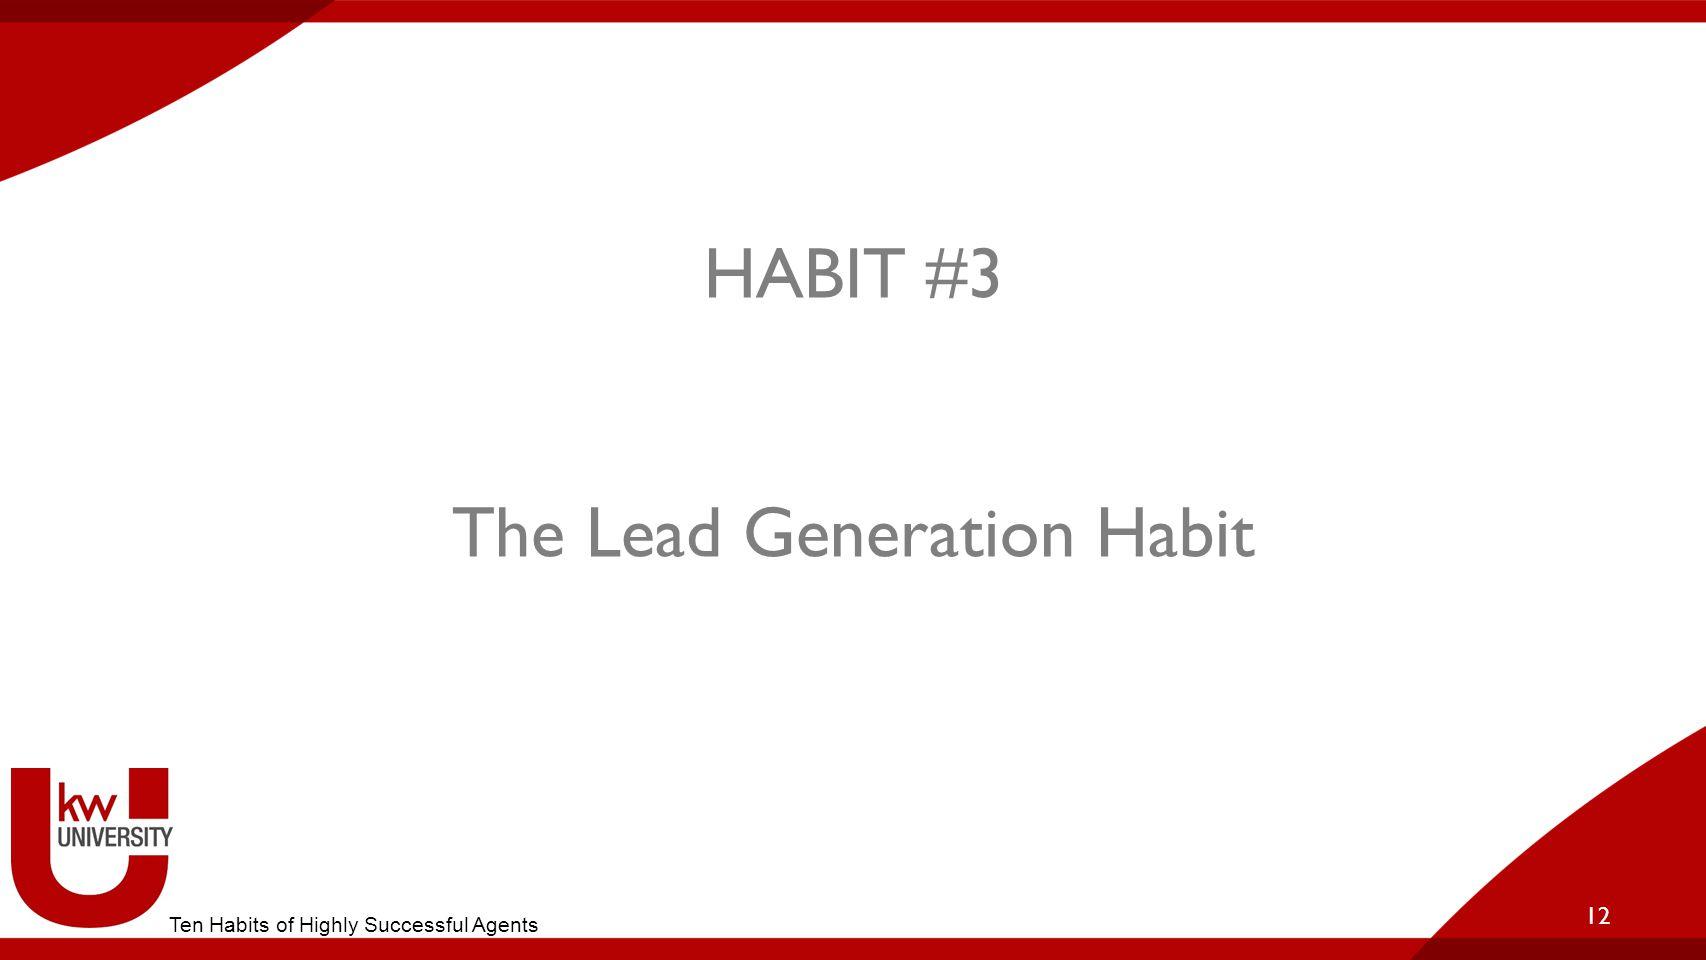 HABIT #3 The Lead Generation Habit